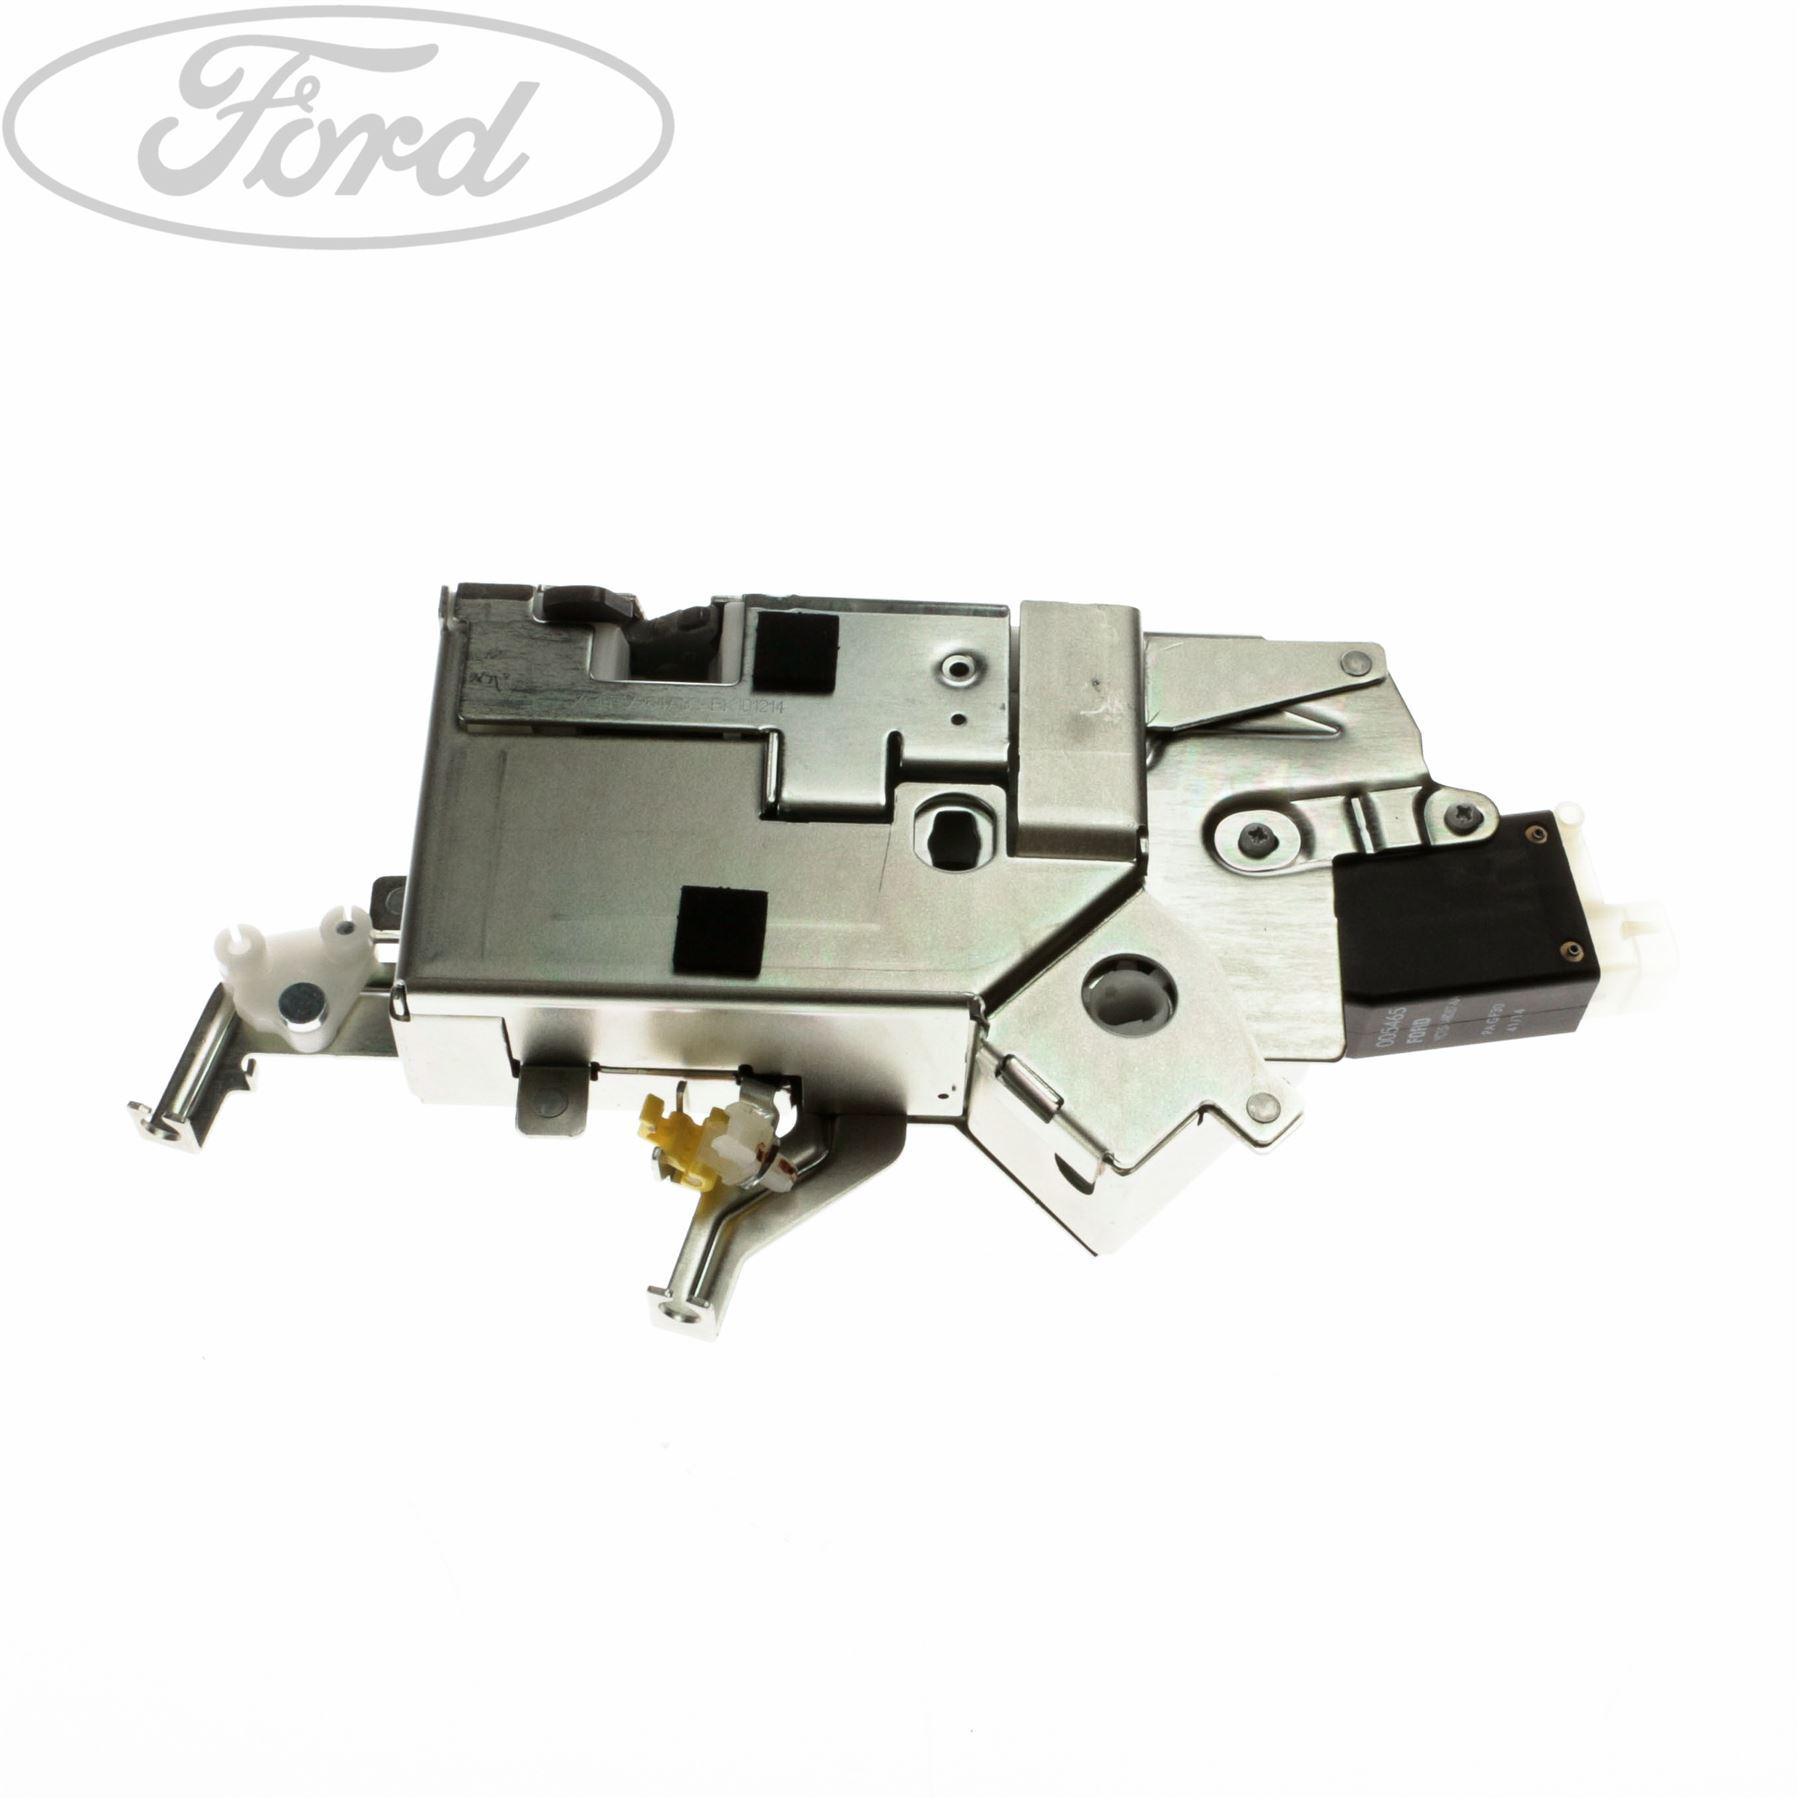 Genuine Ford Transit Mk6 Right Os Sliding Side Door Latch 1766560